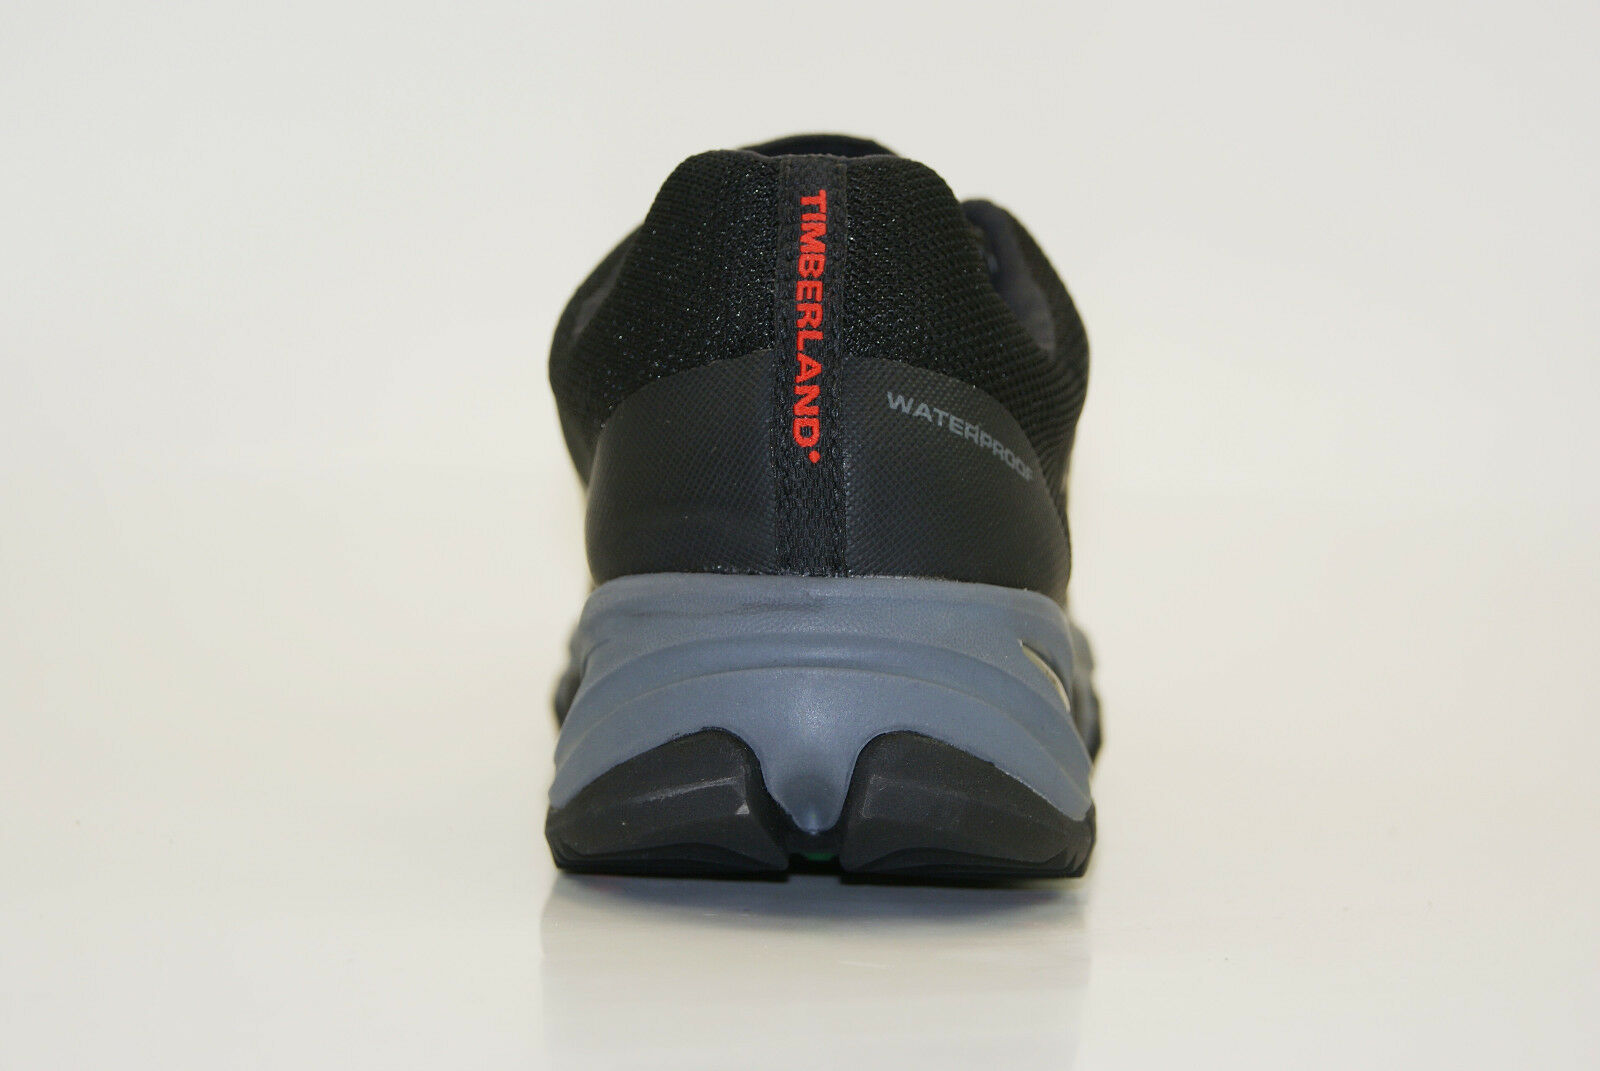 Timberland Litetrace Tg. 43,5 Us 9,5 Impermeabili Scarpe da Passeggiata Passeggiata Passeggiata Uomo | eccellente  | Scolaro/Ragazze Scarpa  ed870a